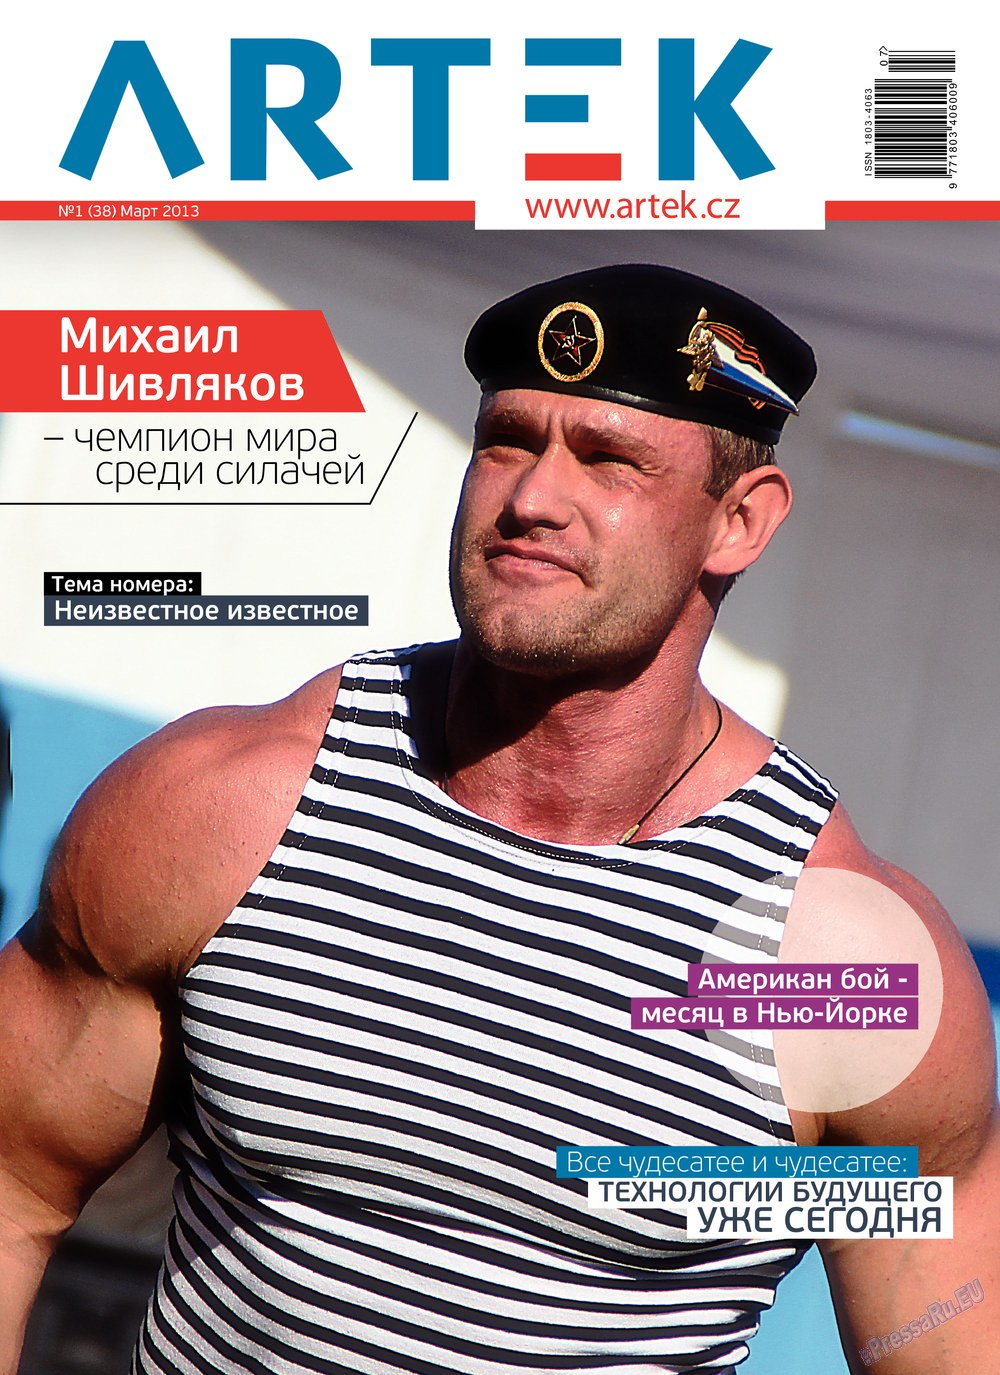 Артек (журнал). 2013 год, номер 1, стр. 1